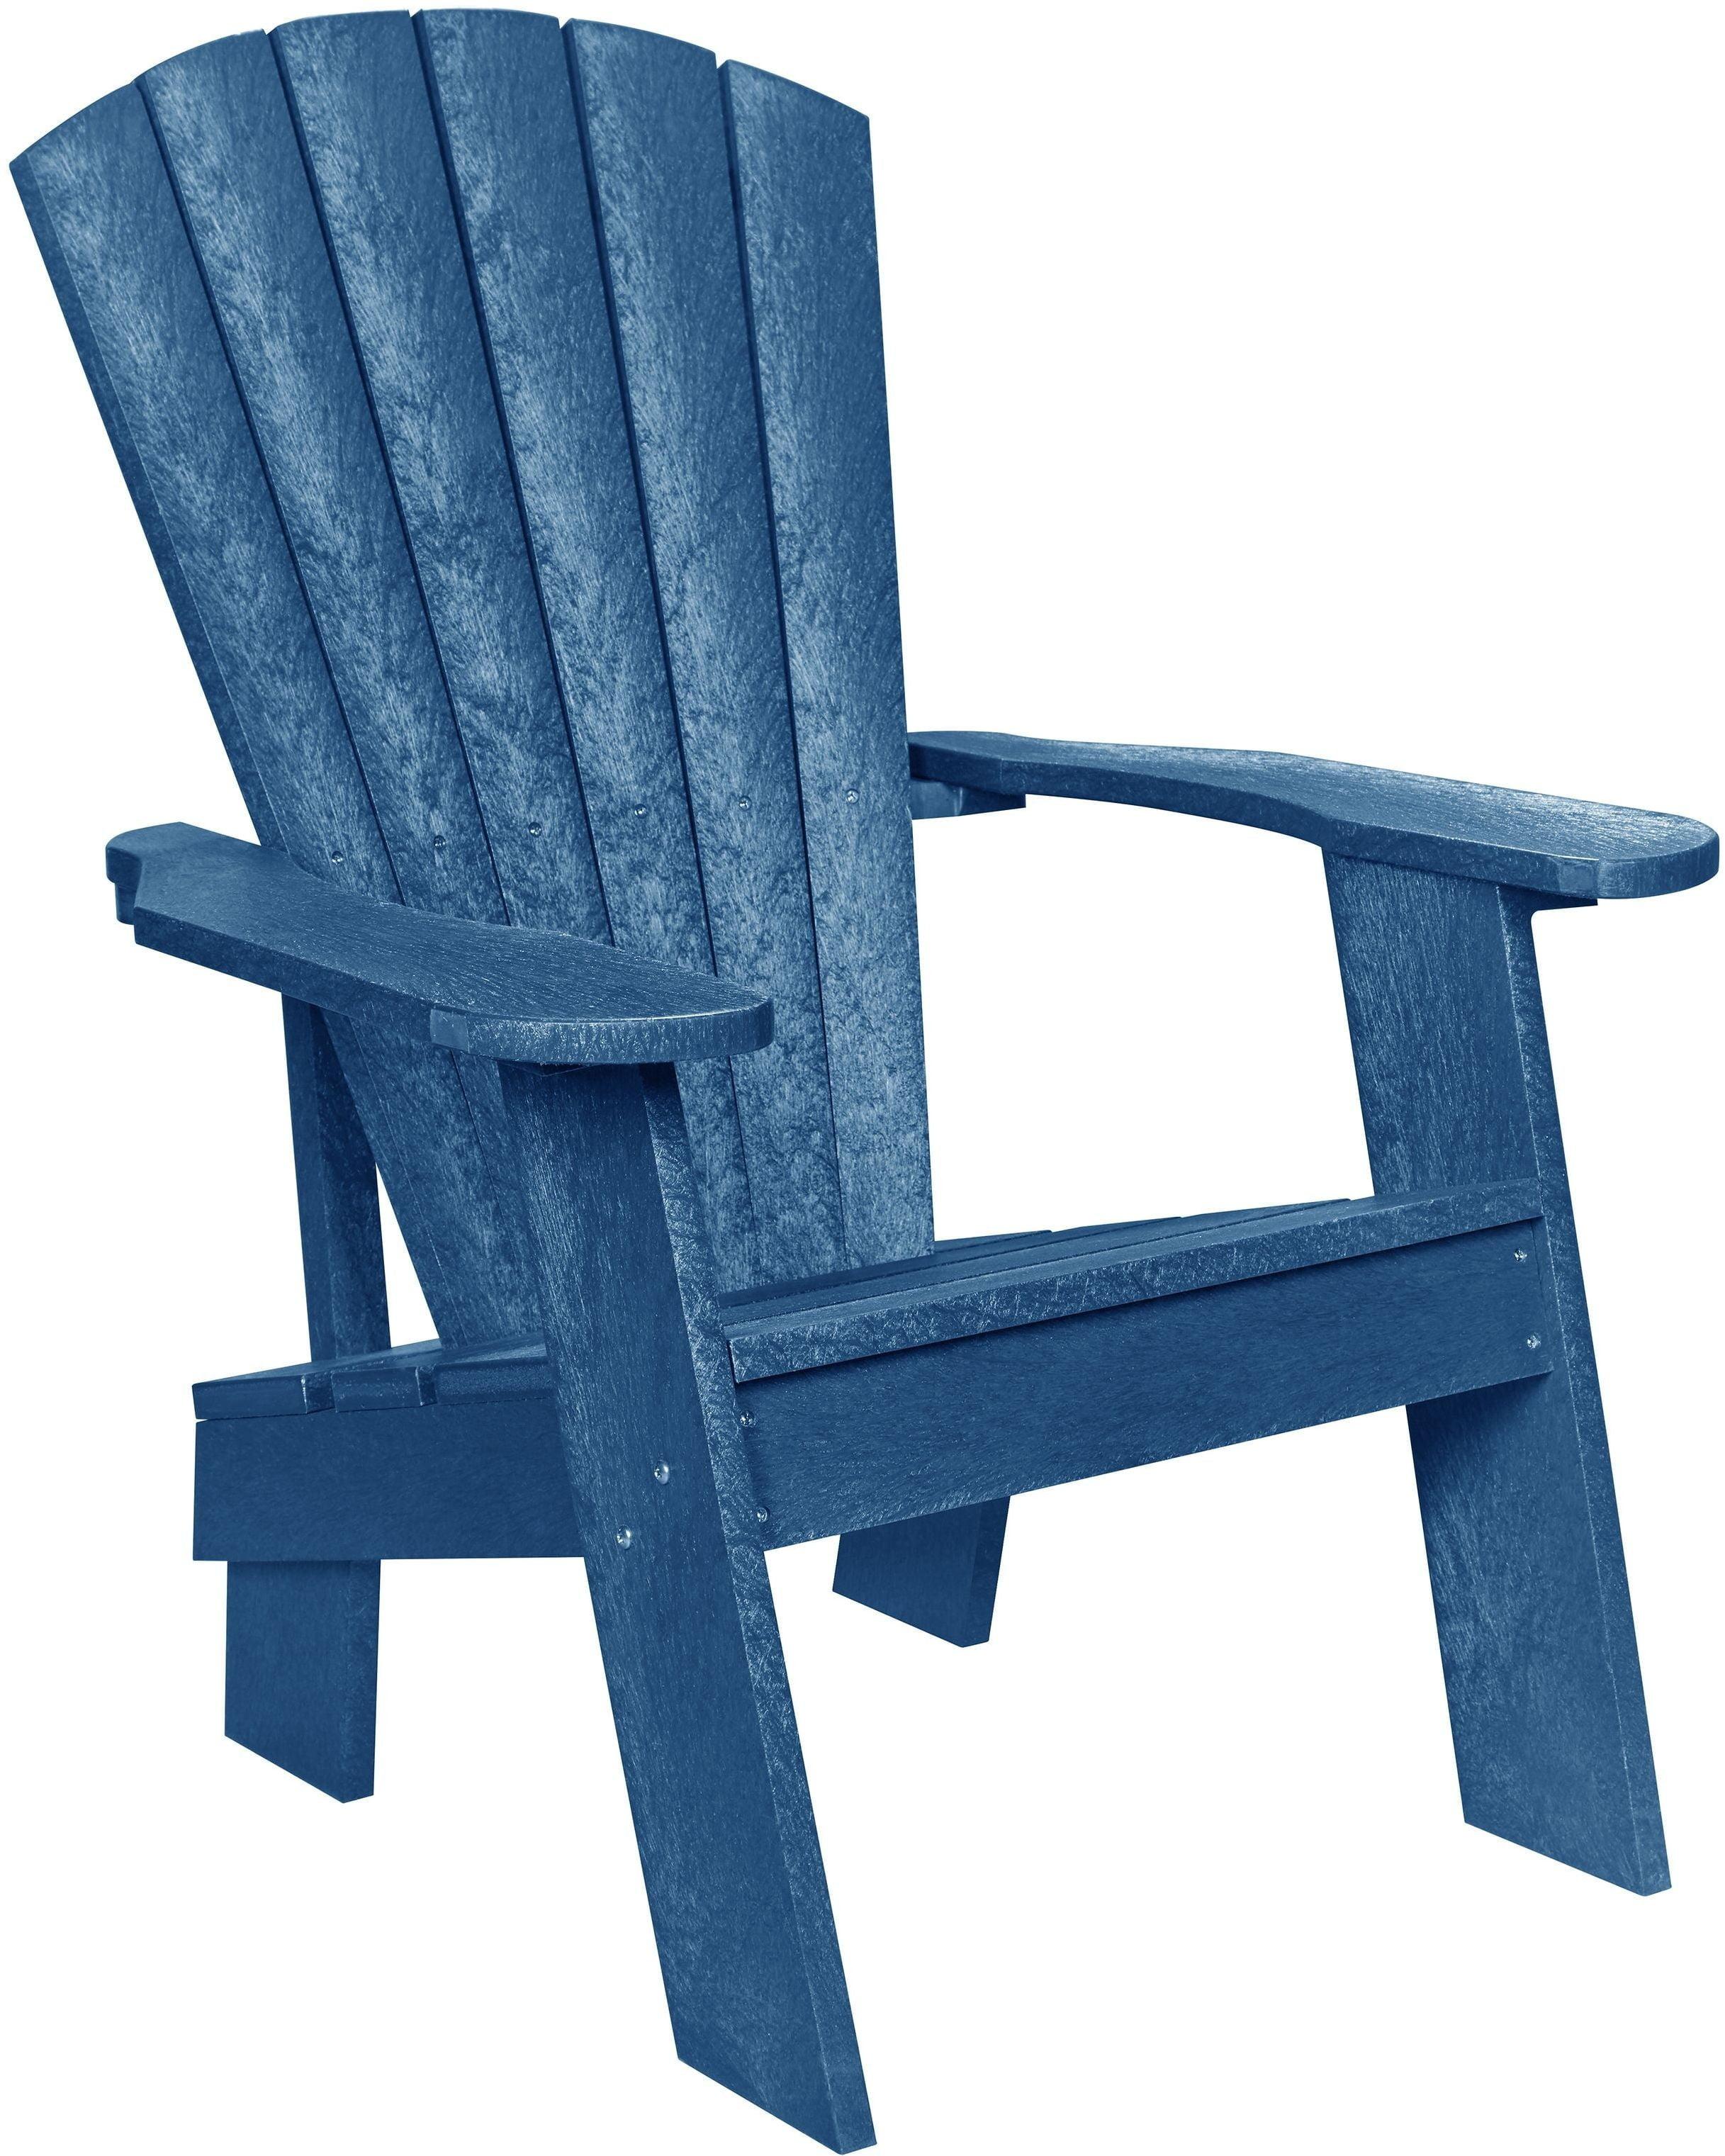 Captiva Casual Cobalt Blue Adirondack Chair From CR Plastic | Coleman  Furniture